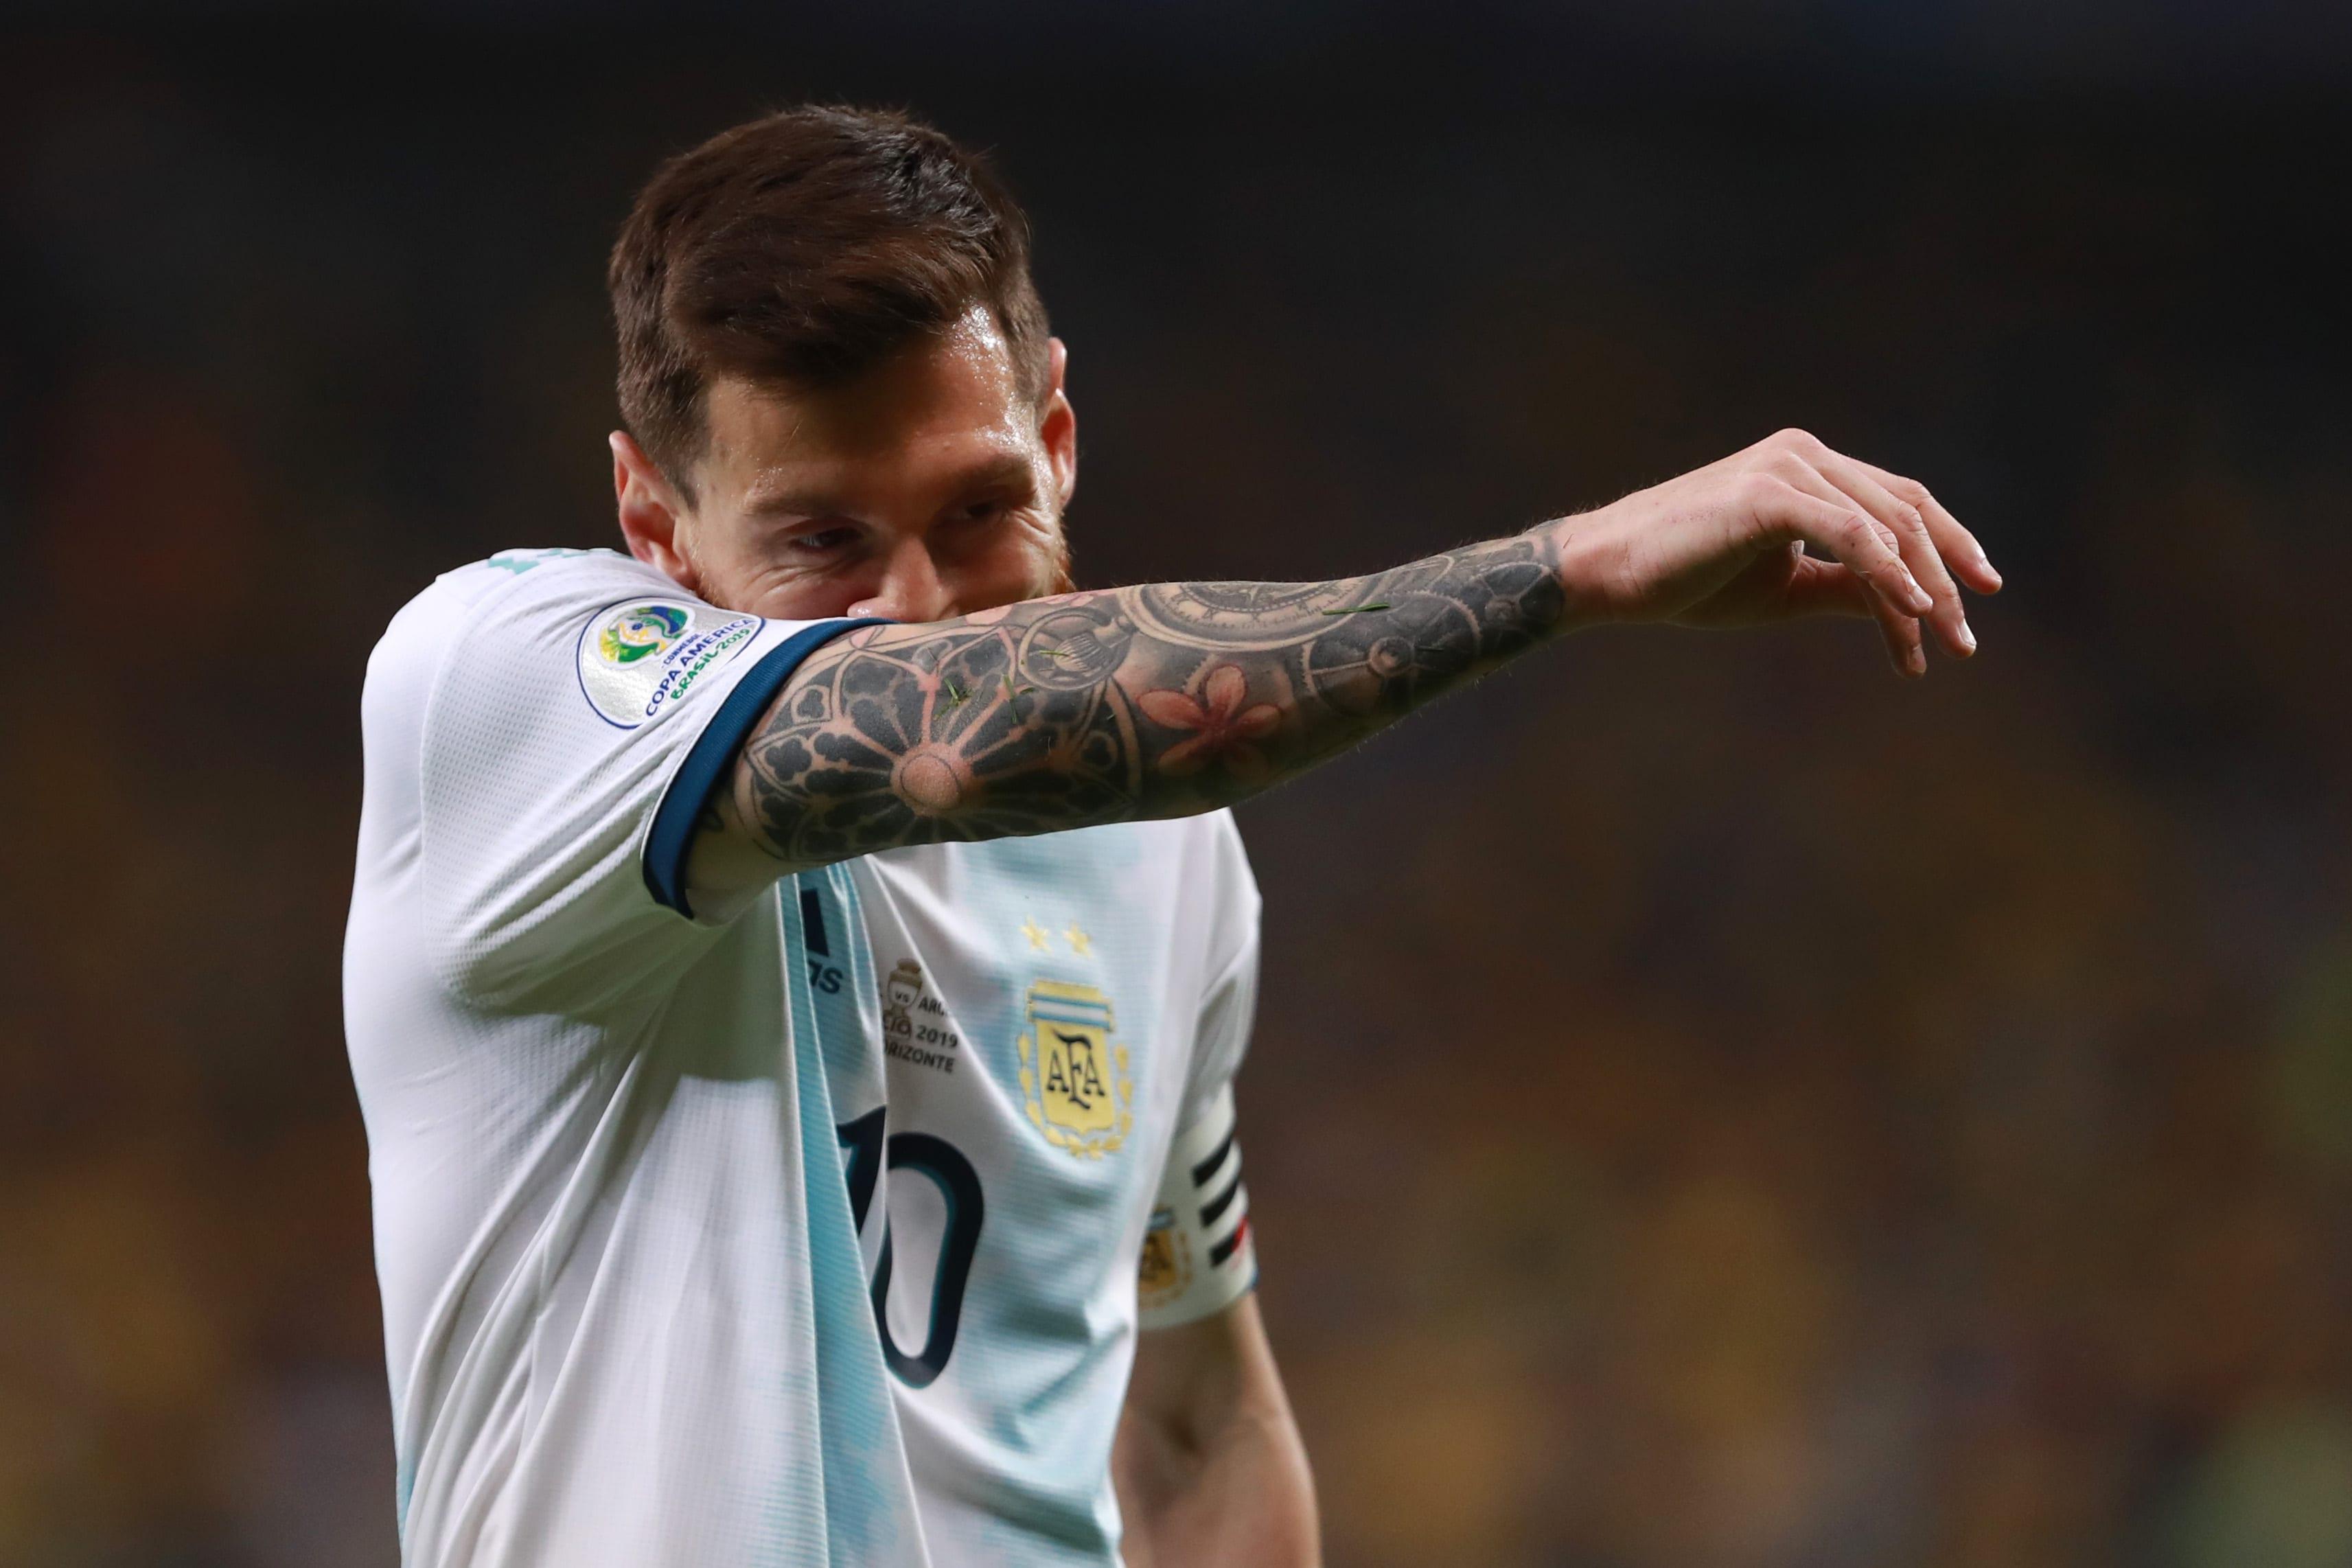 Messi pode atingir marca pela Argentina